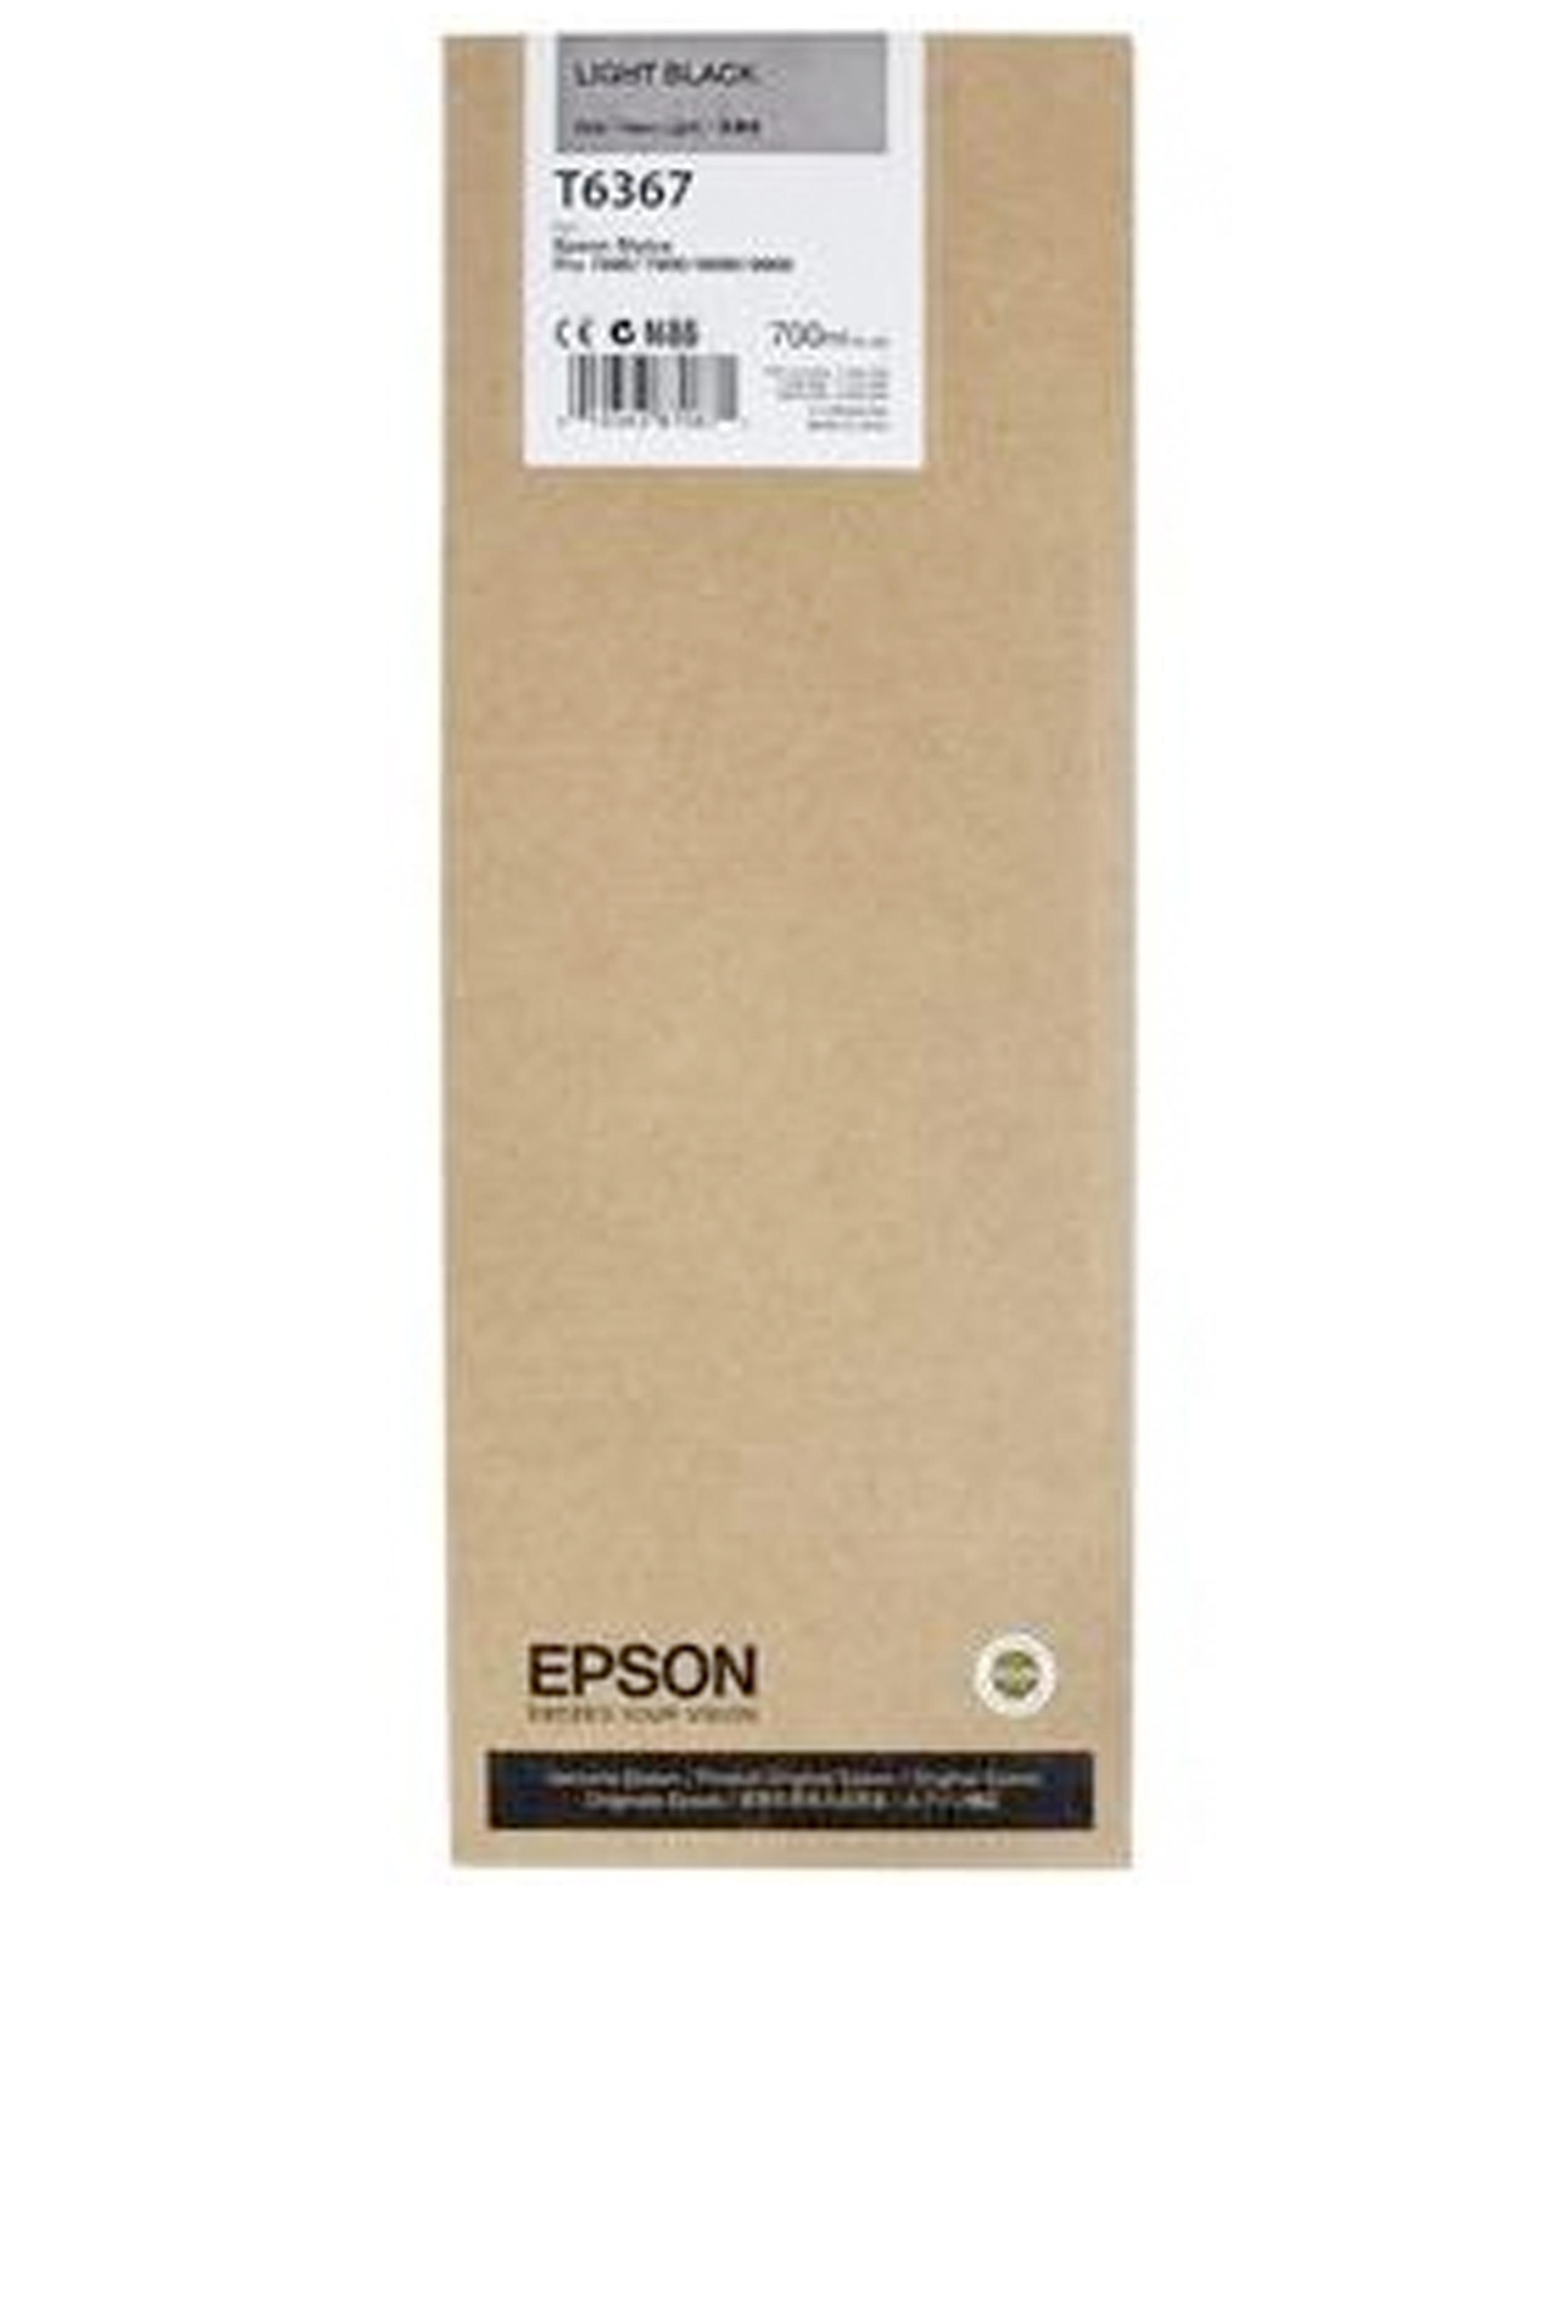 Epson EPSON HI LT BLACK INK (700 ML) (T636700)